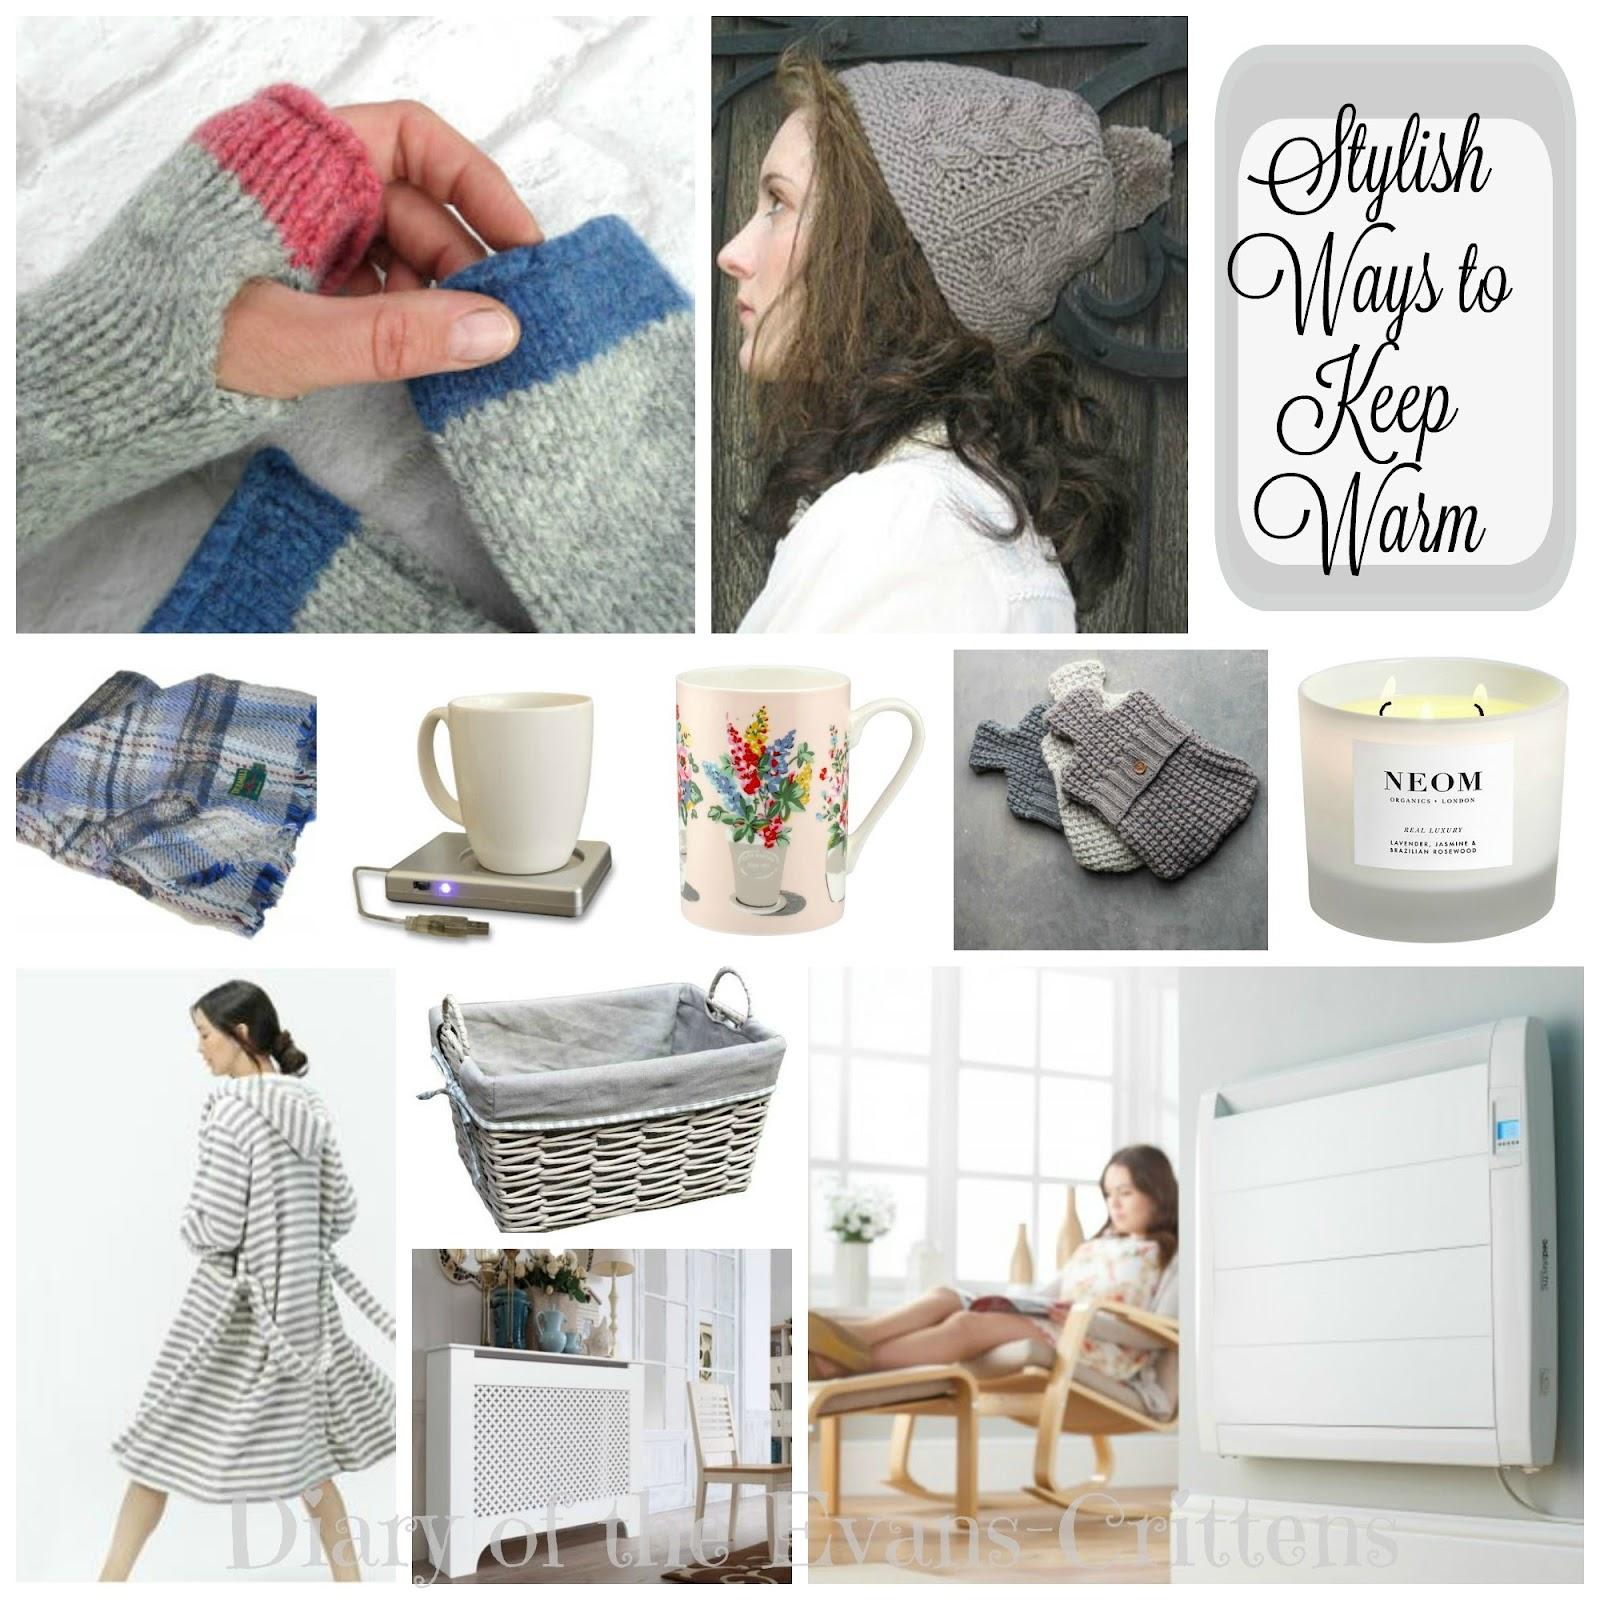 Stylish ways to keep warm